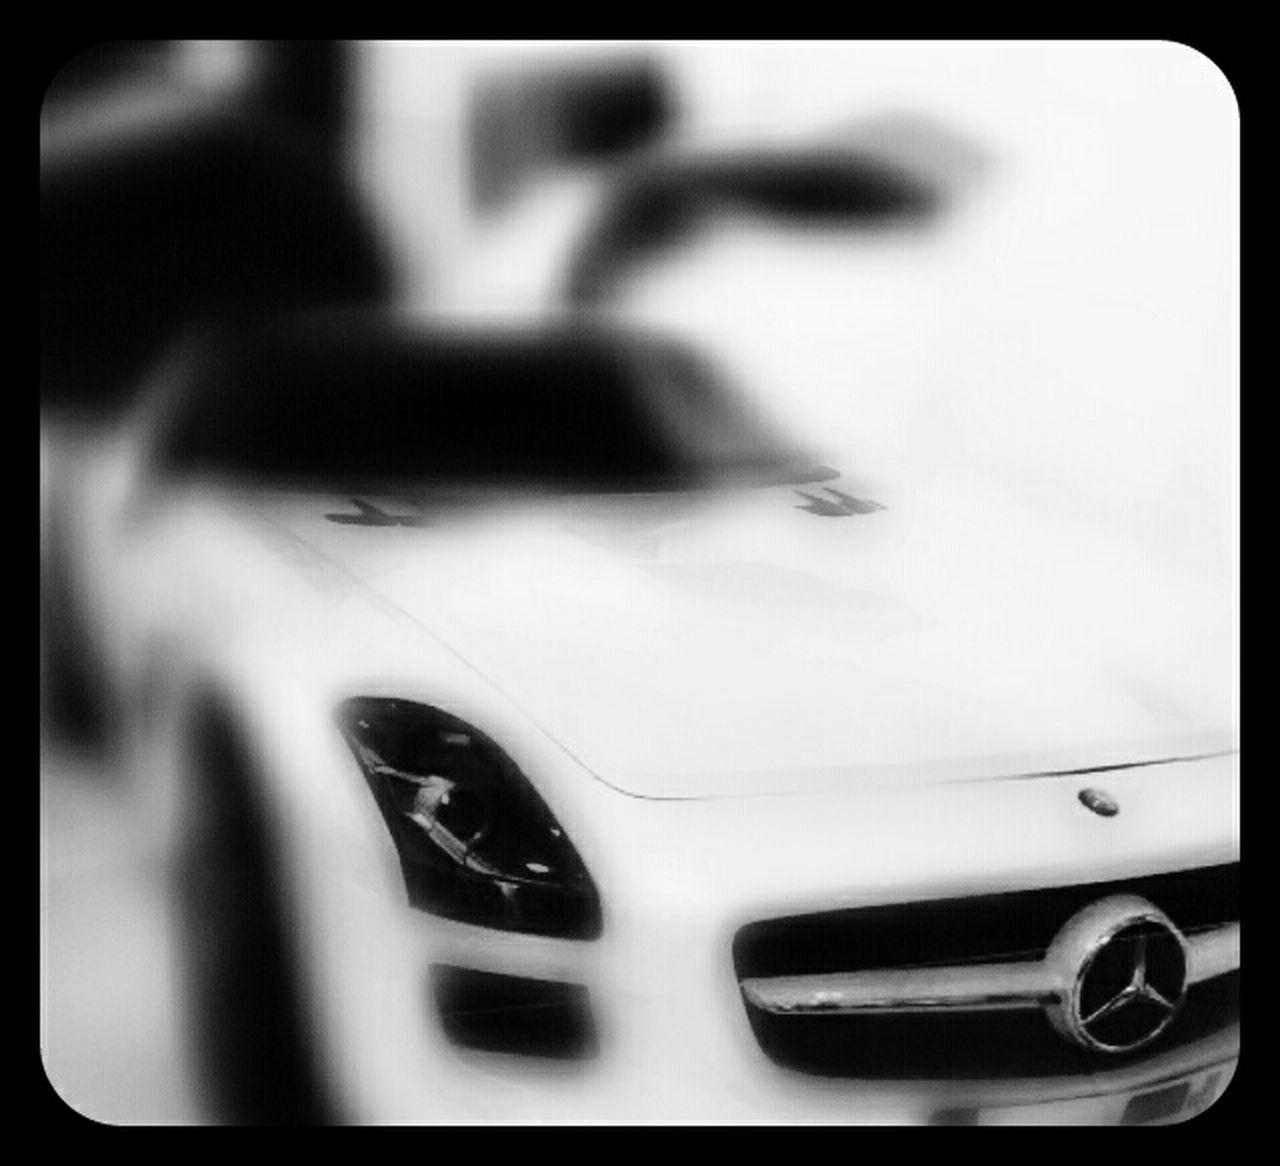 car, transportation, land vehicle, mode of transport, day, racecar, no people, modern, outdoors, close-up, parking garage